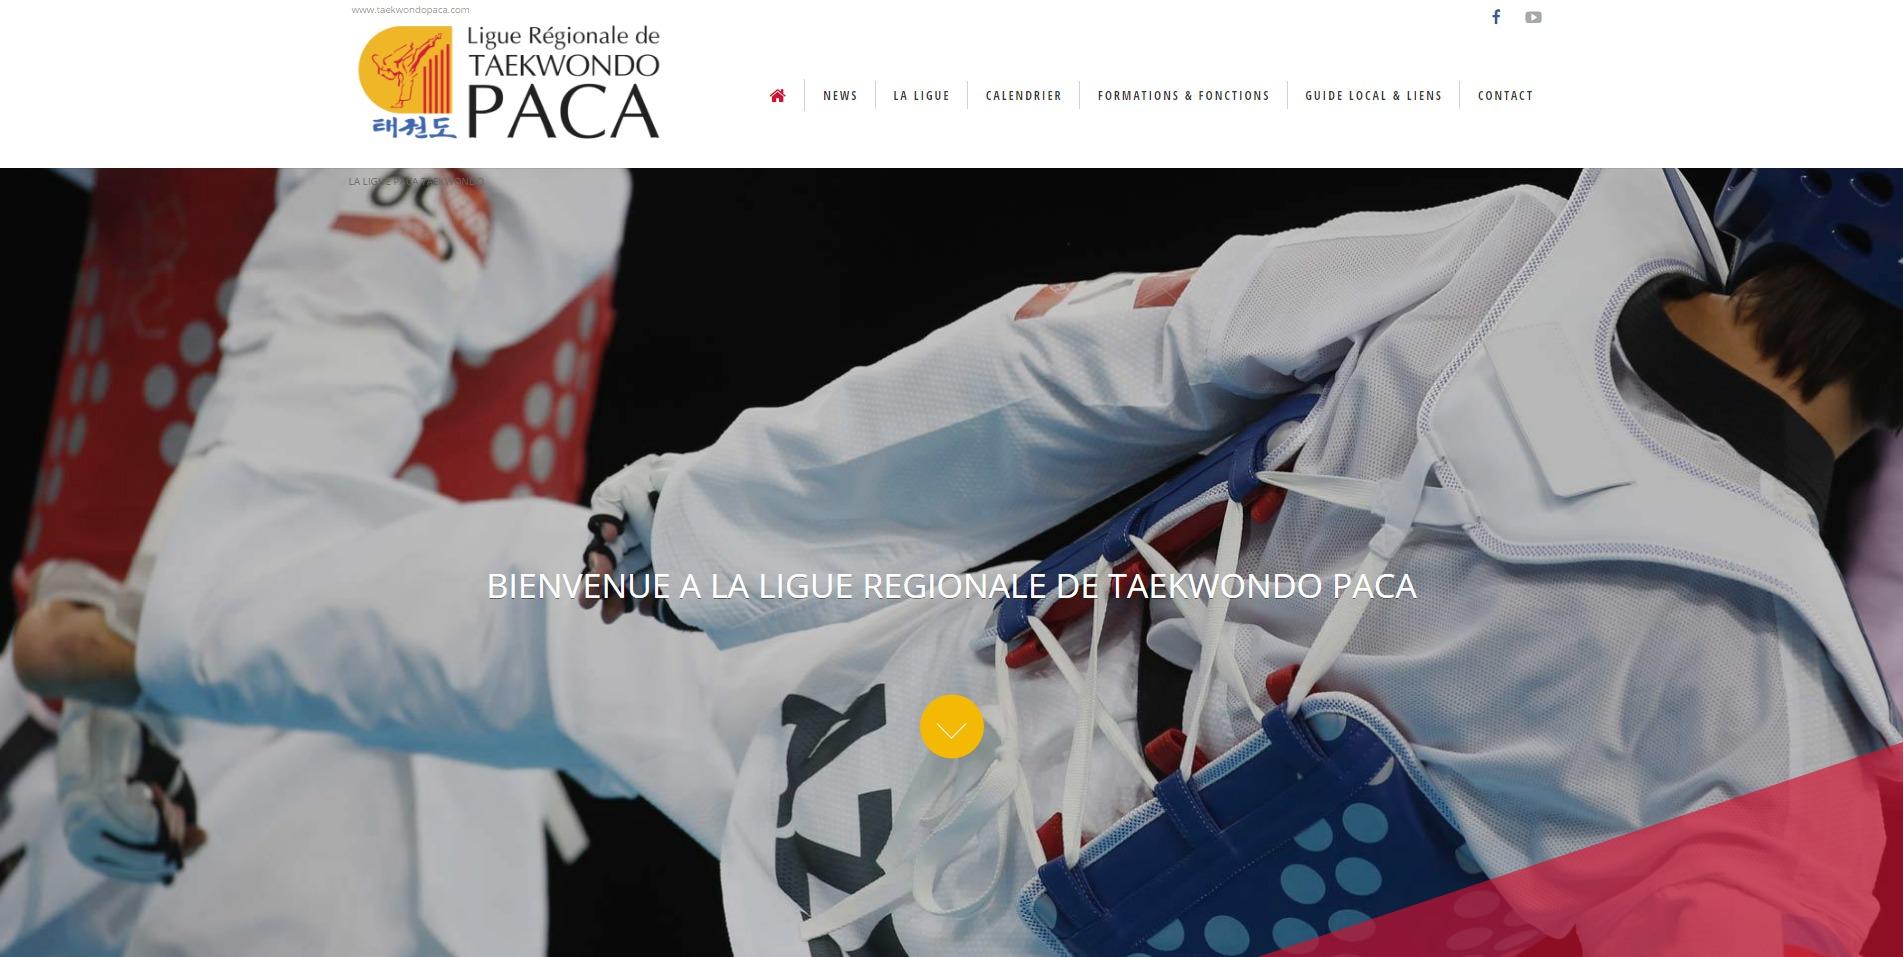 ligue regionale taekwondo paca